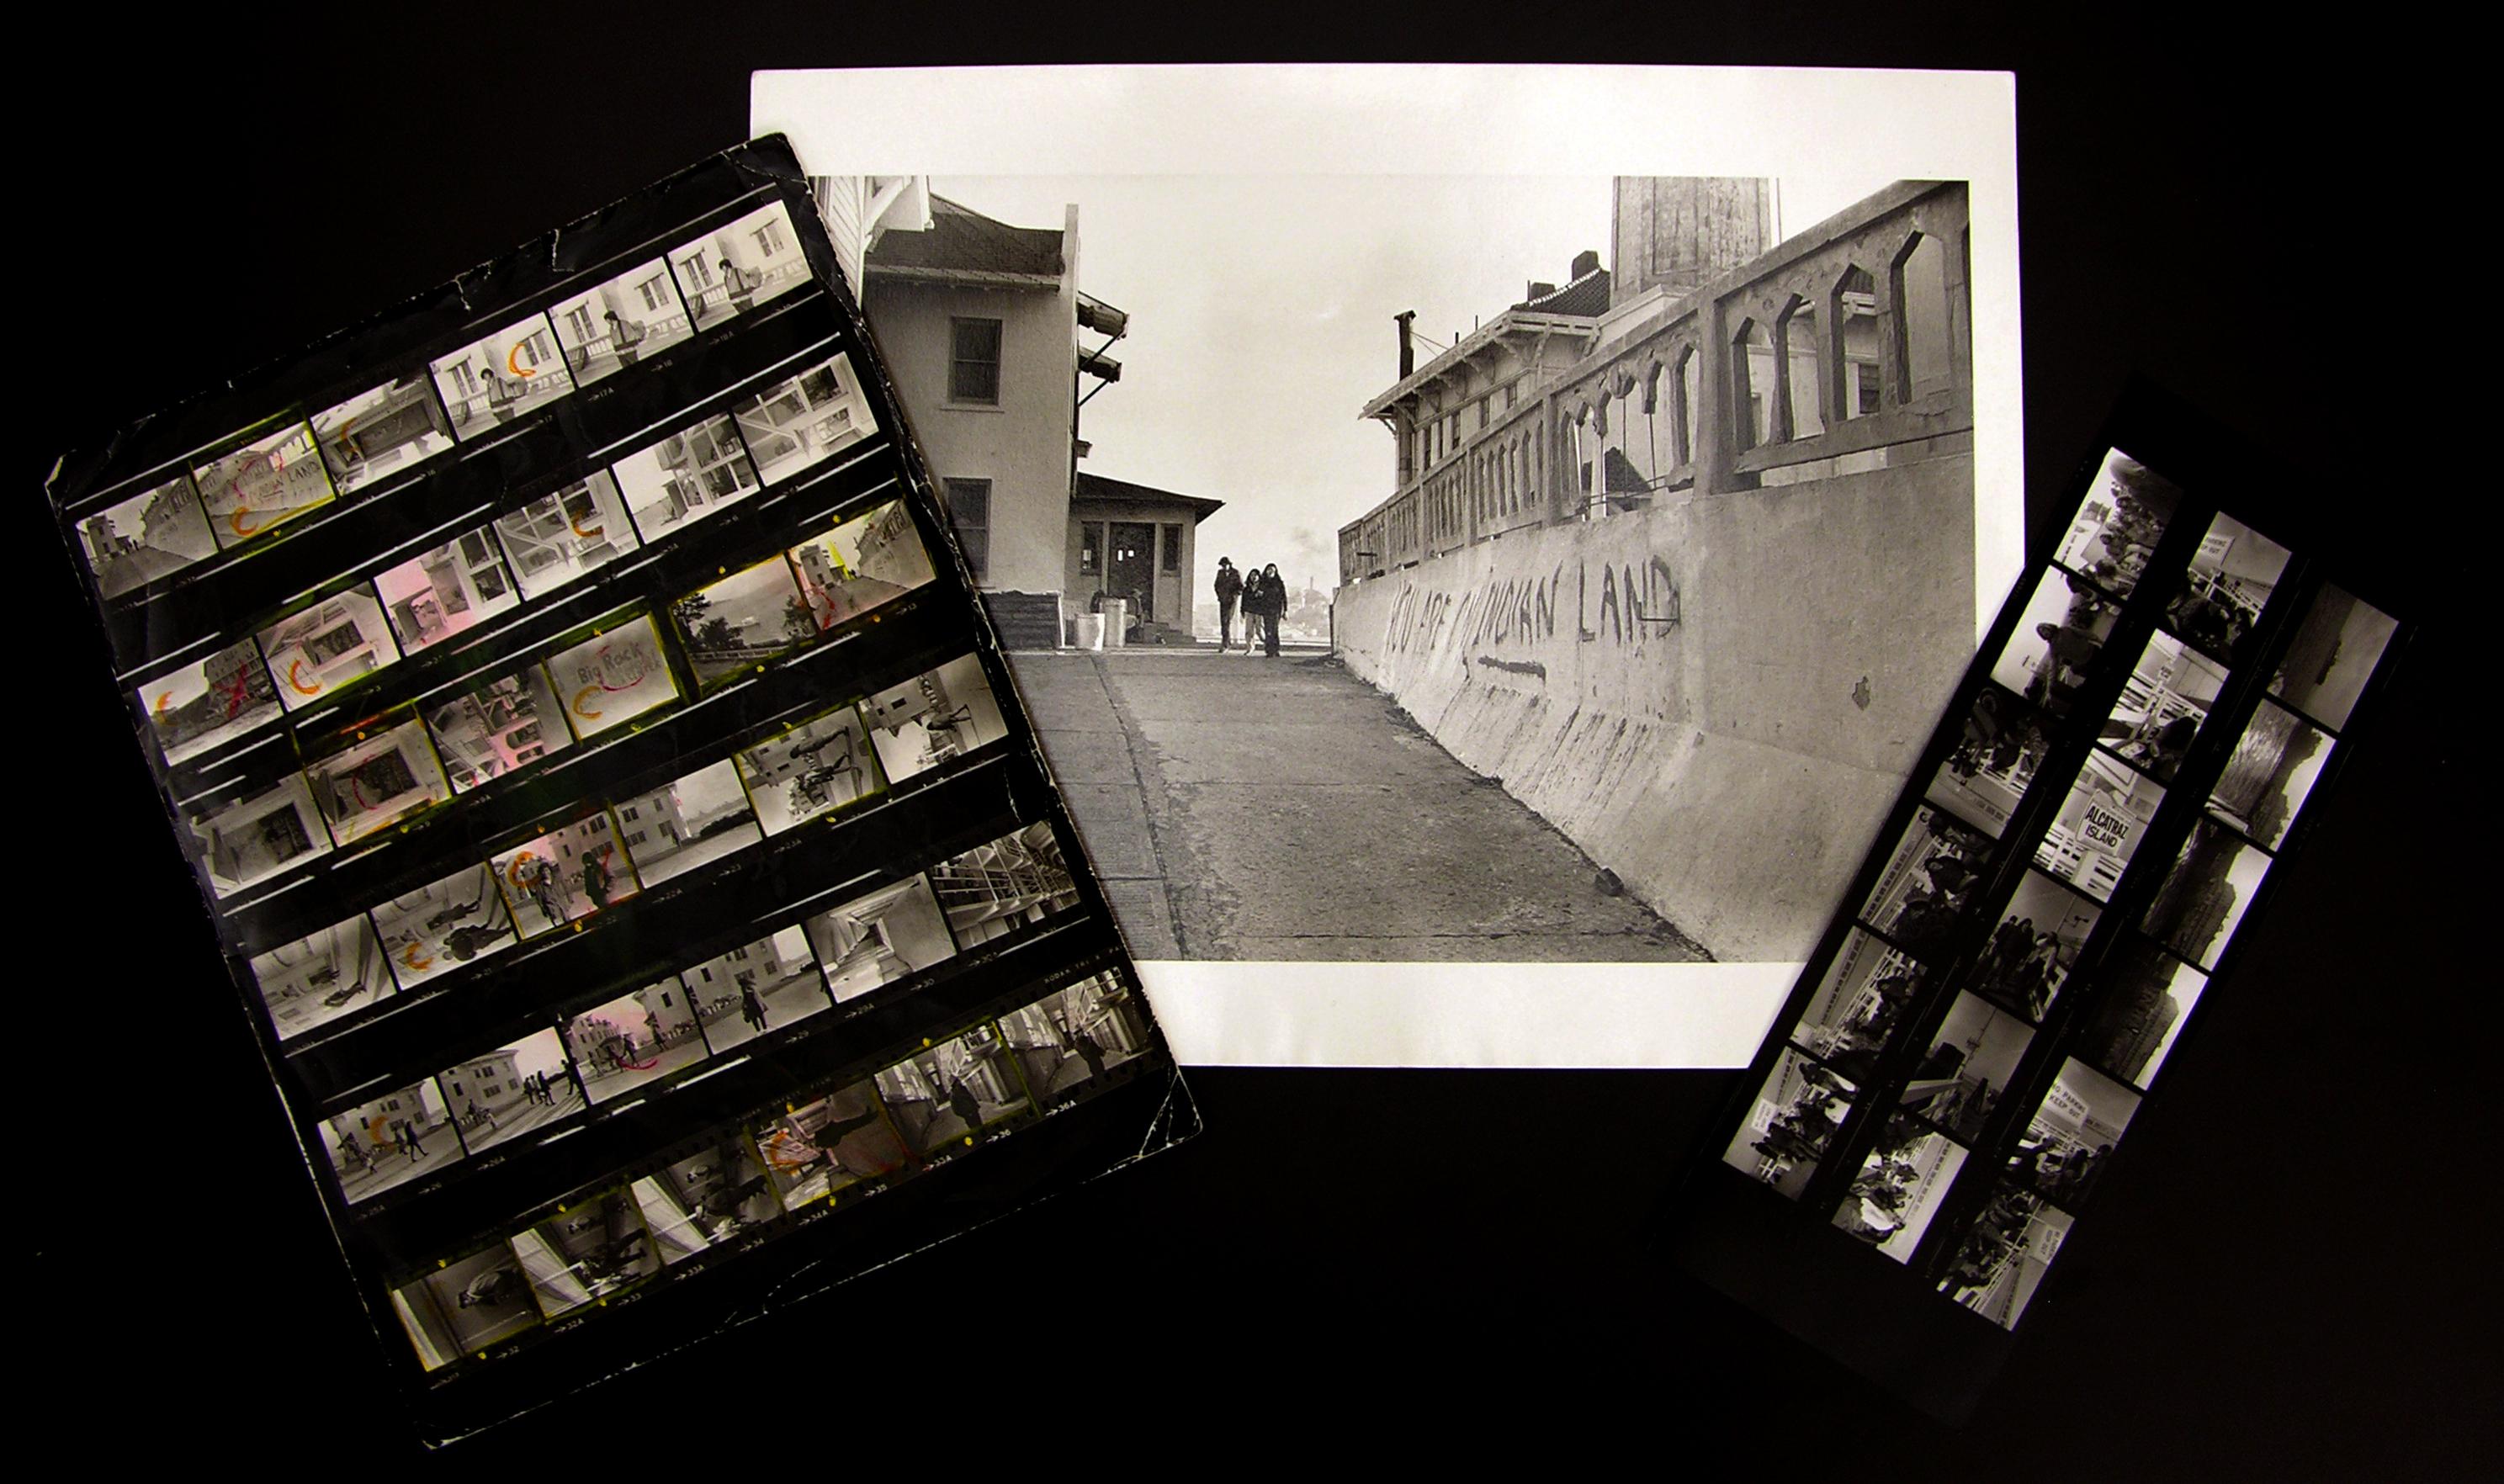 Contact sheets of Alcatraz occupation